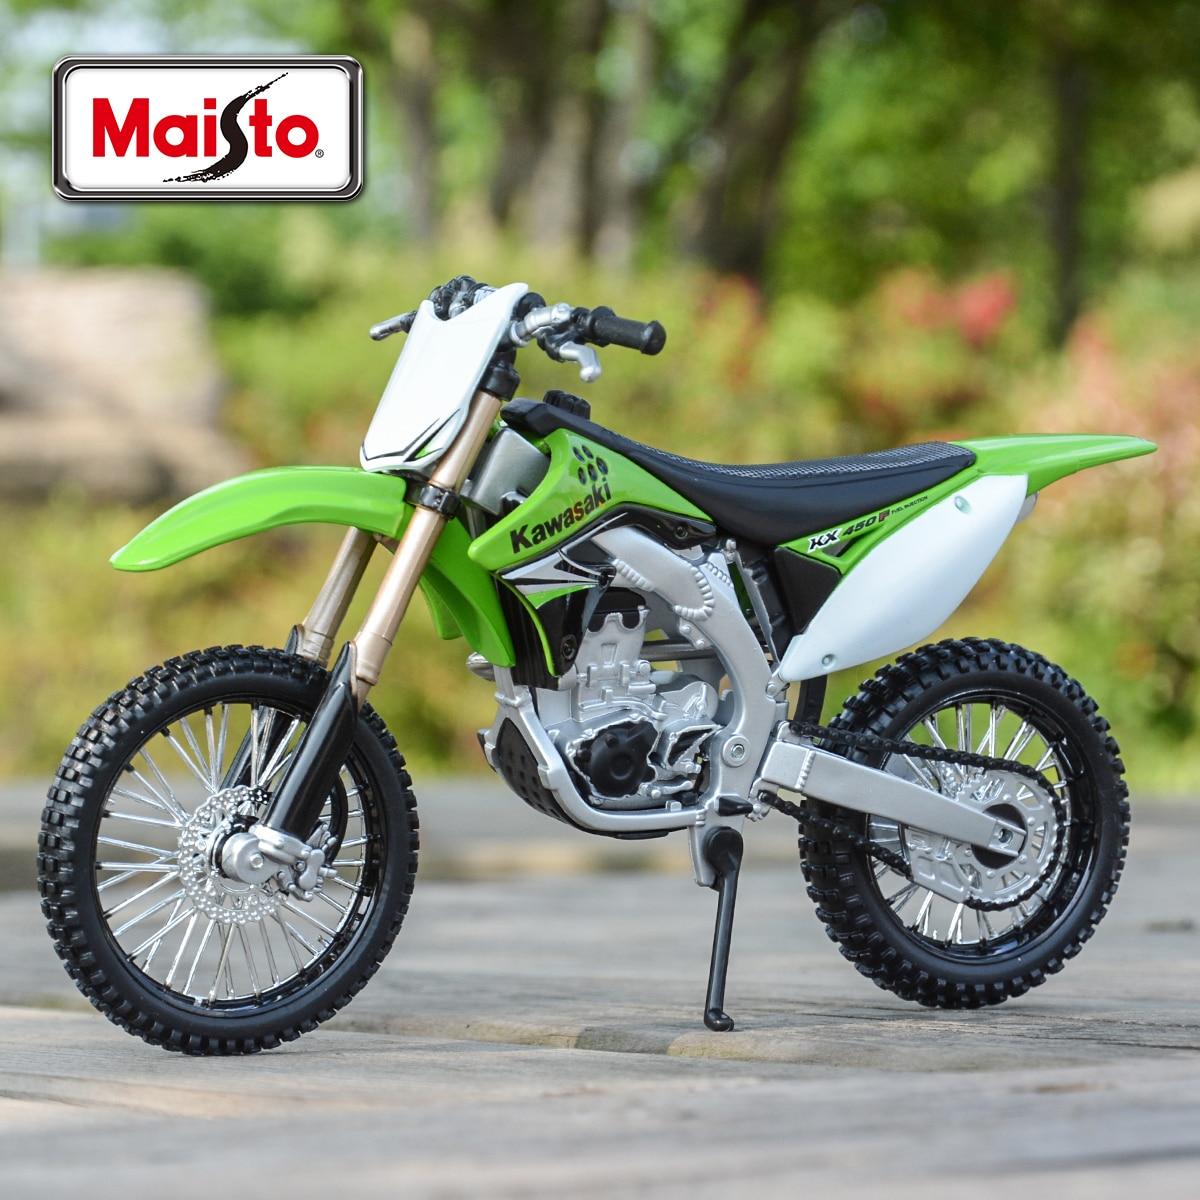 Maisto 1:12 Kawasaki KX 450F Green Die Cast Vehicles Collectible Hobbies Motorcycle Model Toys